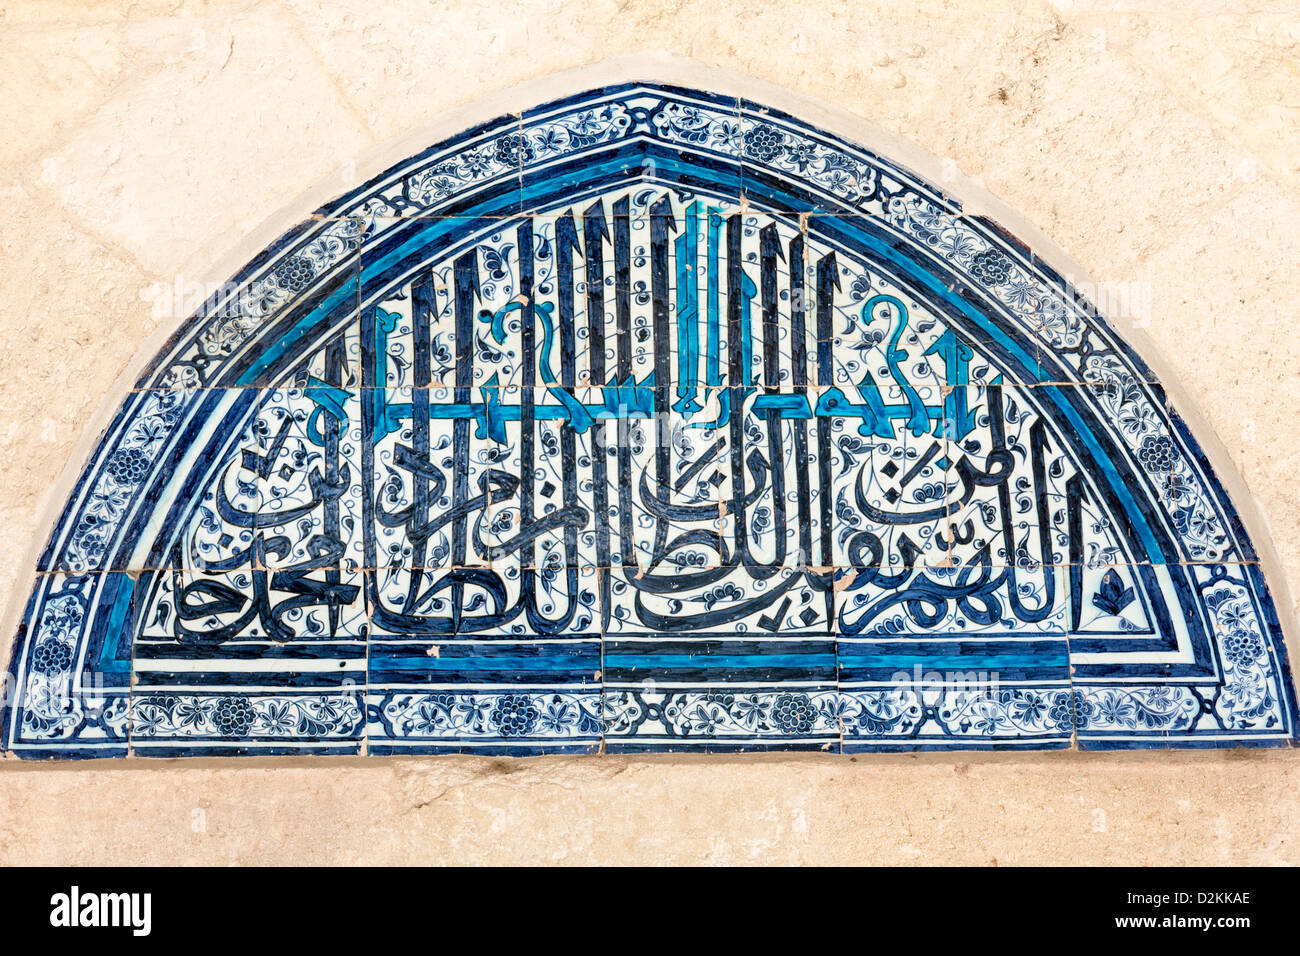 unter Glasur bemalten Fliesen-Panel, Üç Sherefeli (drei Balkon) Moschee, Edirne, Türkei Stockbild